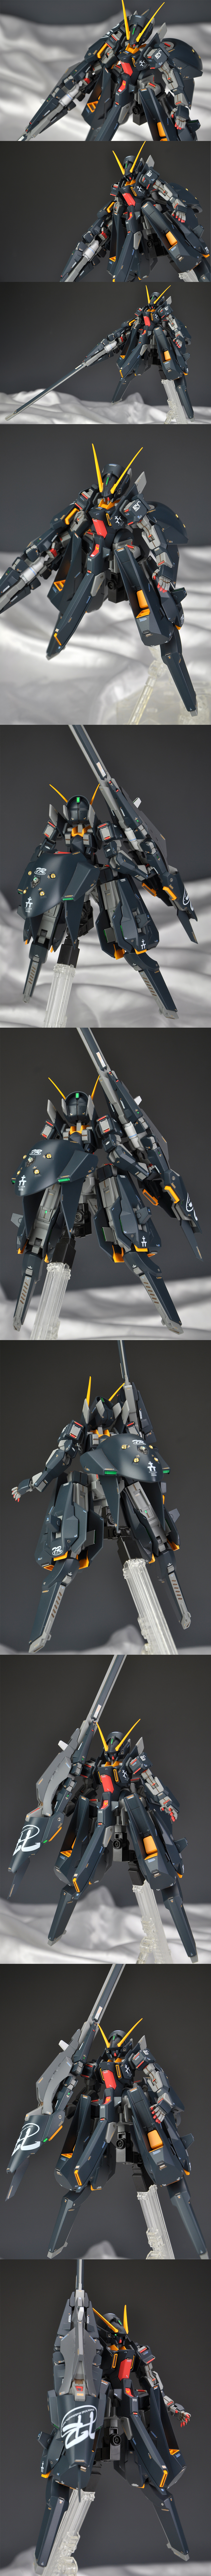 1/100 RX-124 GUNDAM TR-6 (Woundwort)改